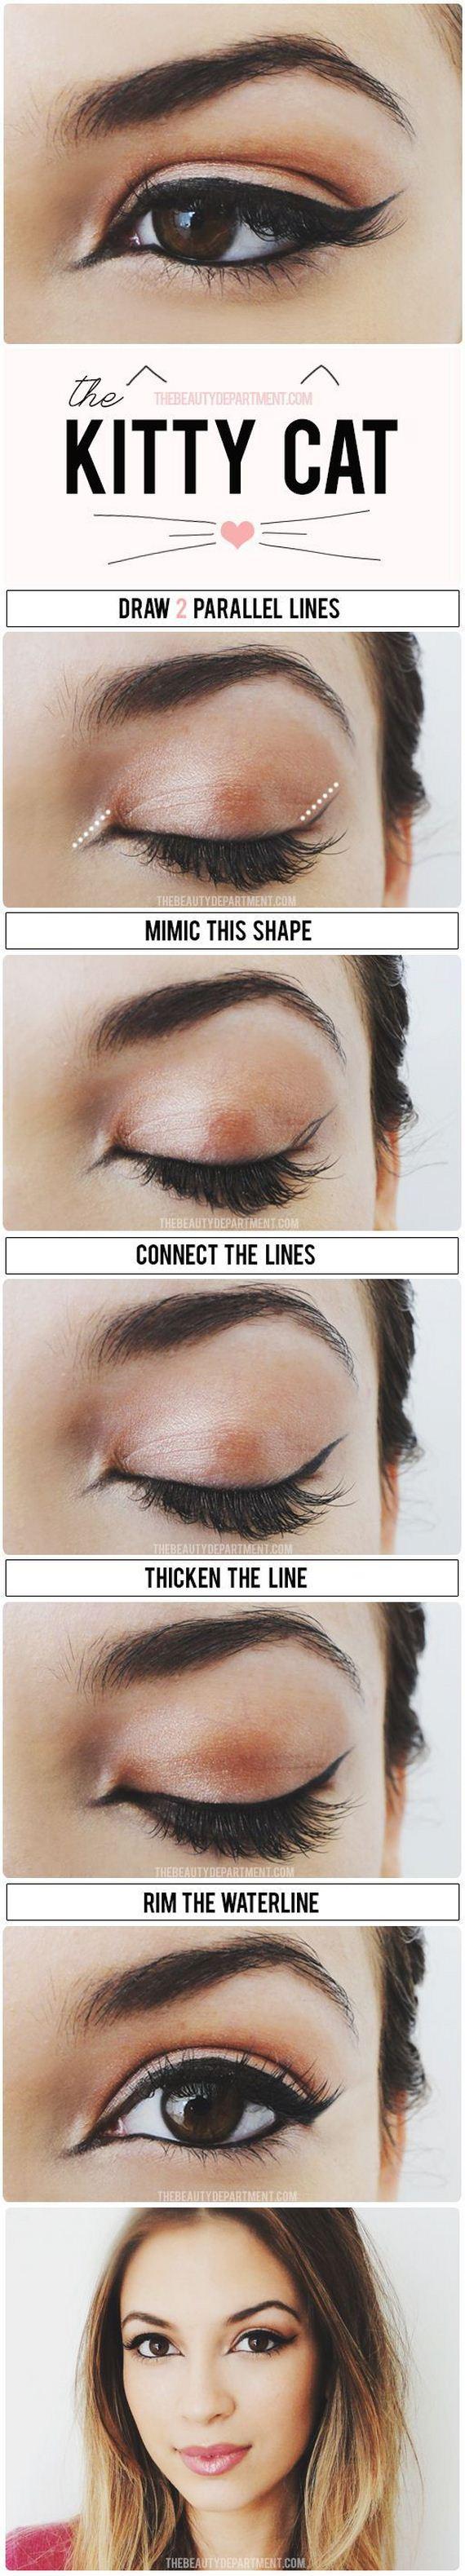 08-Fun-Eyeliner-Tutorials